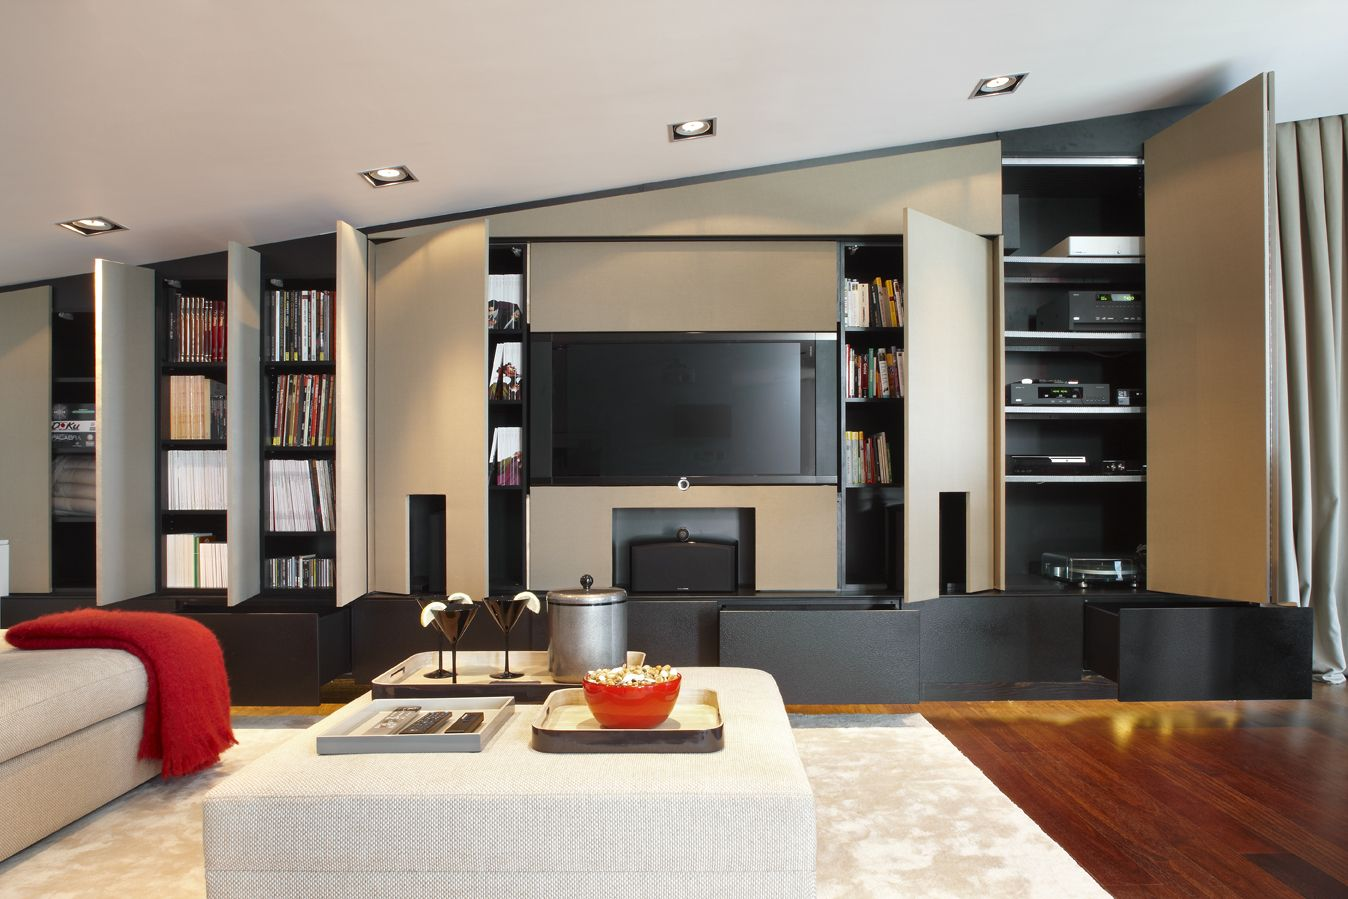 Molins interiors arquitectura interior interiorismo - Salon de estar decoracion ...